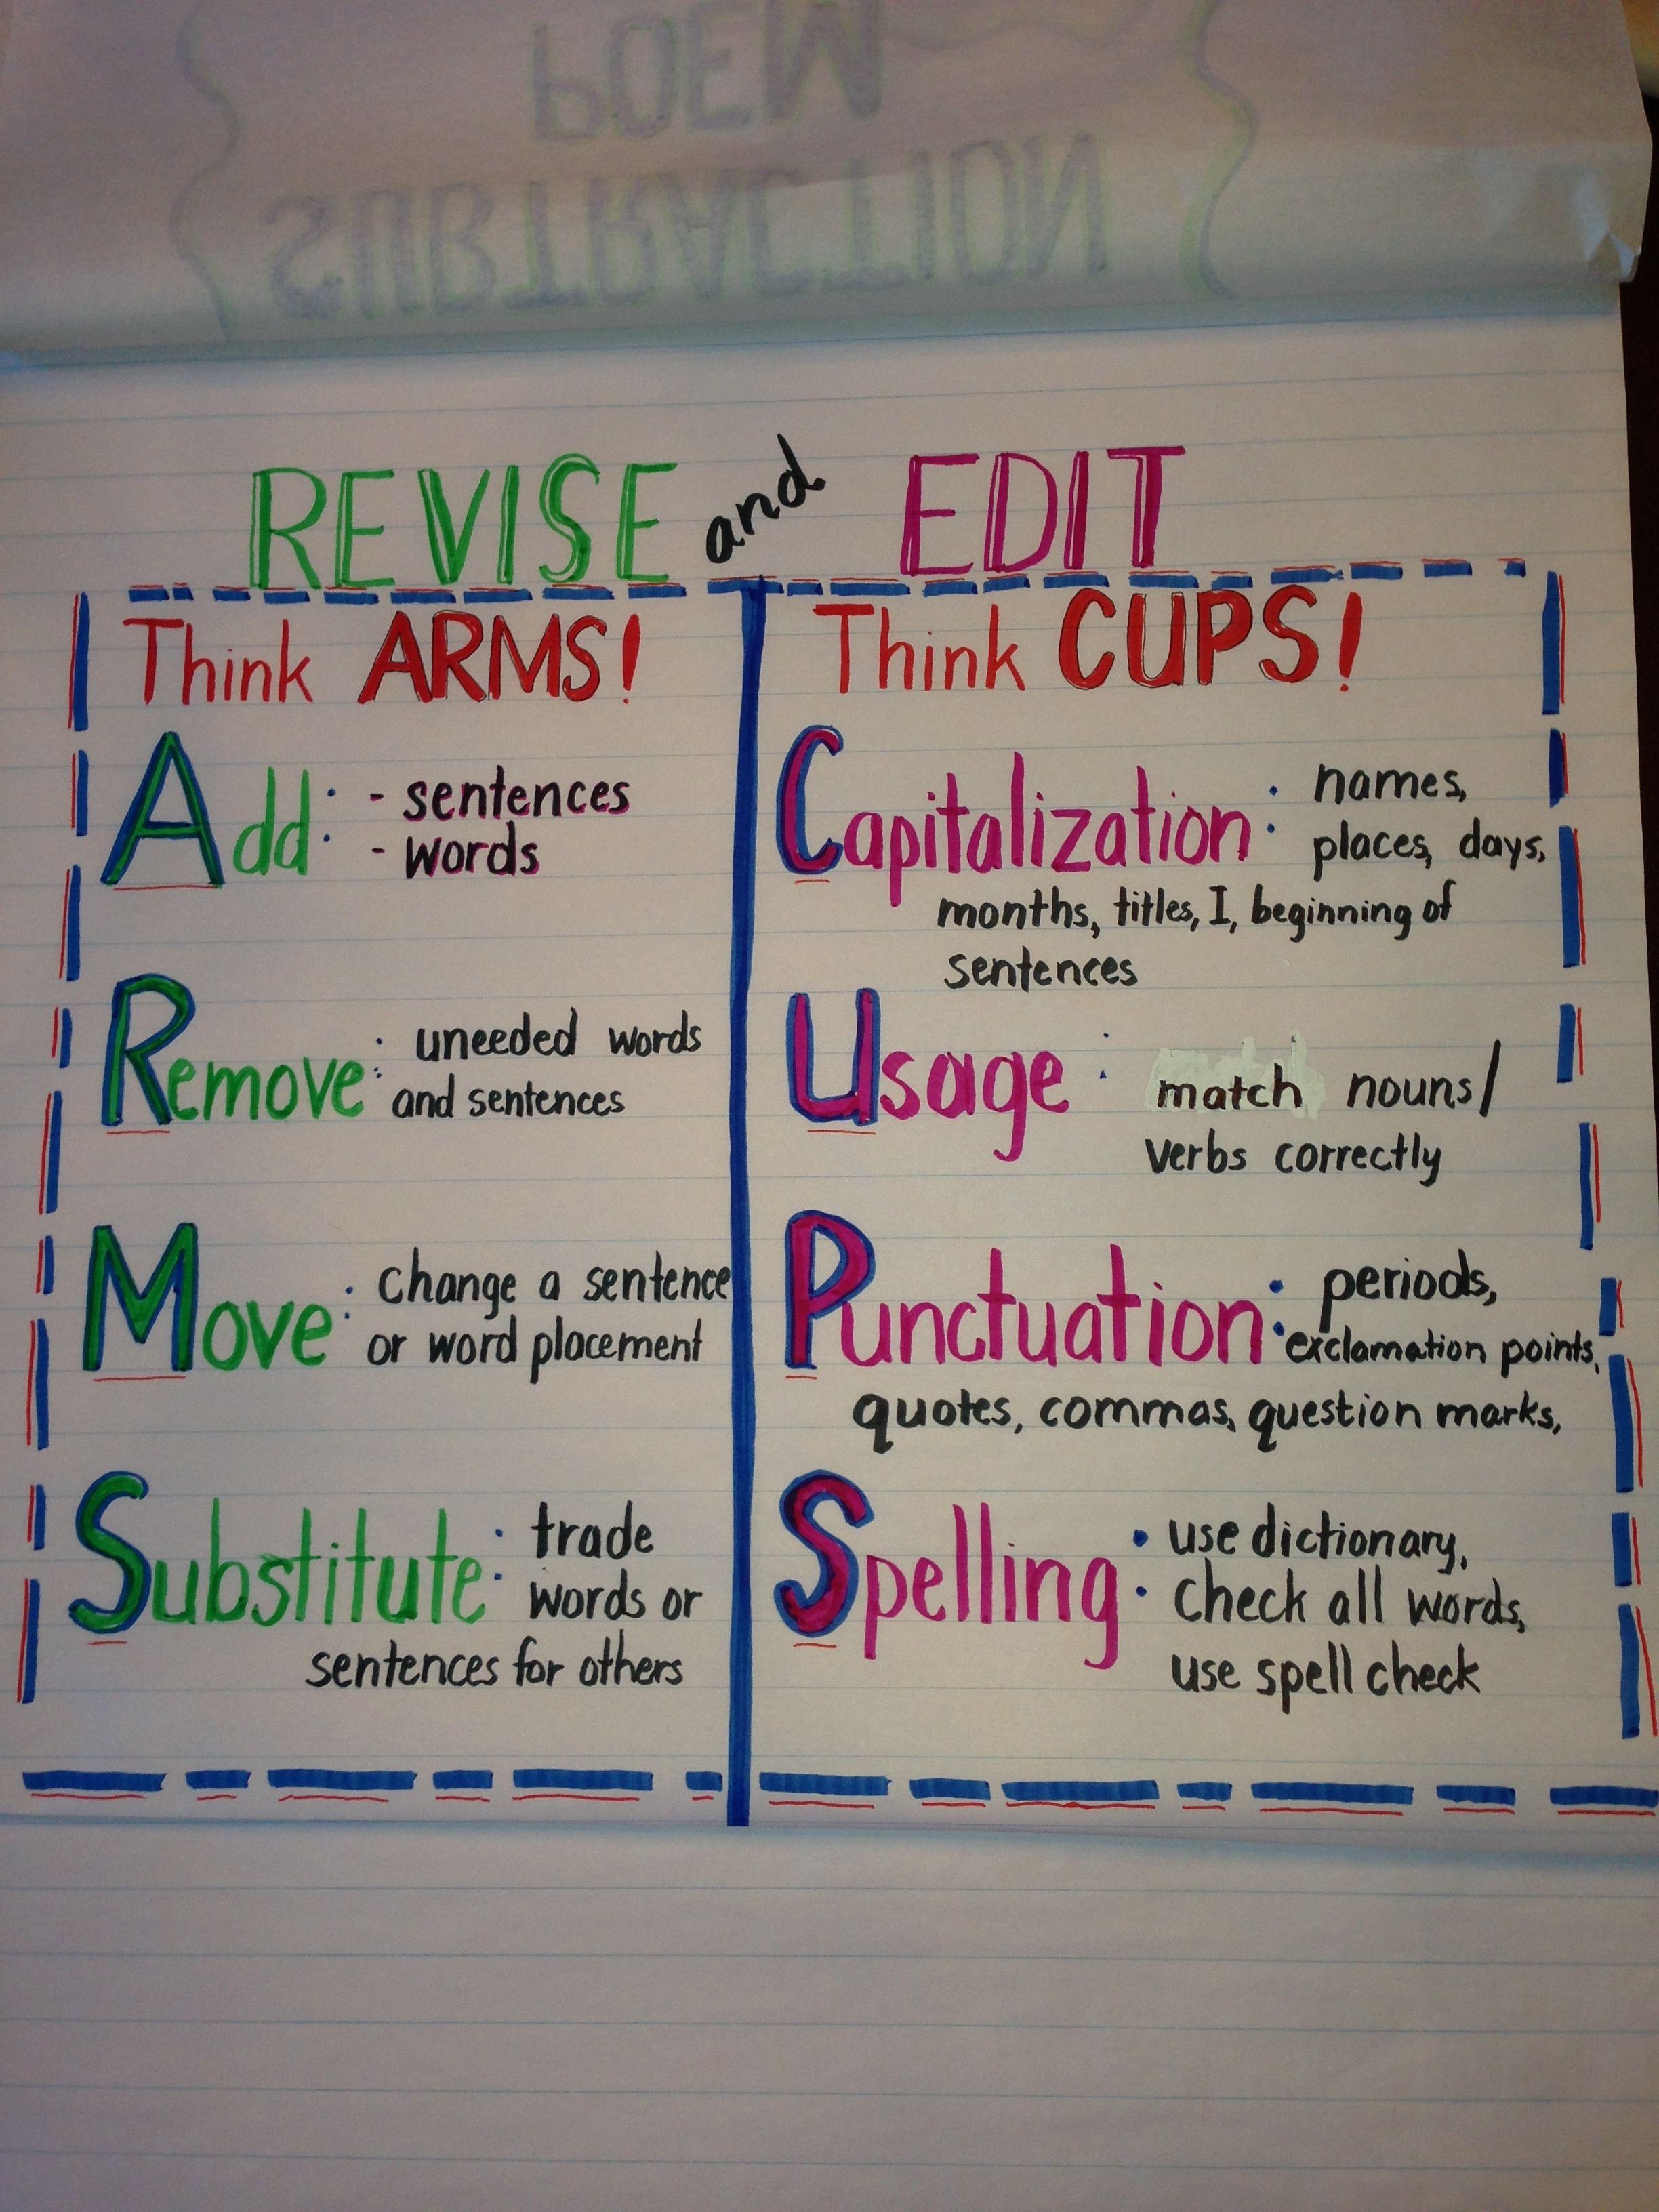 Revising And Editing Both Parts Of The Writing Process 2nd Grade Worksheets Nouns And Verbs 2nd Grade Writing [ 3264 x 2448 Pixel ]